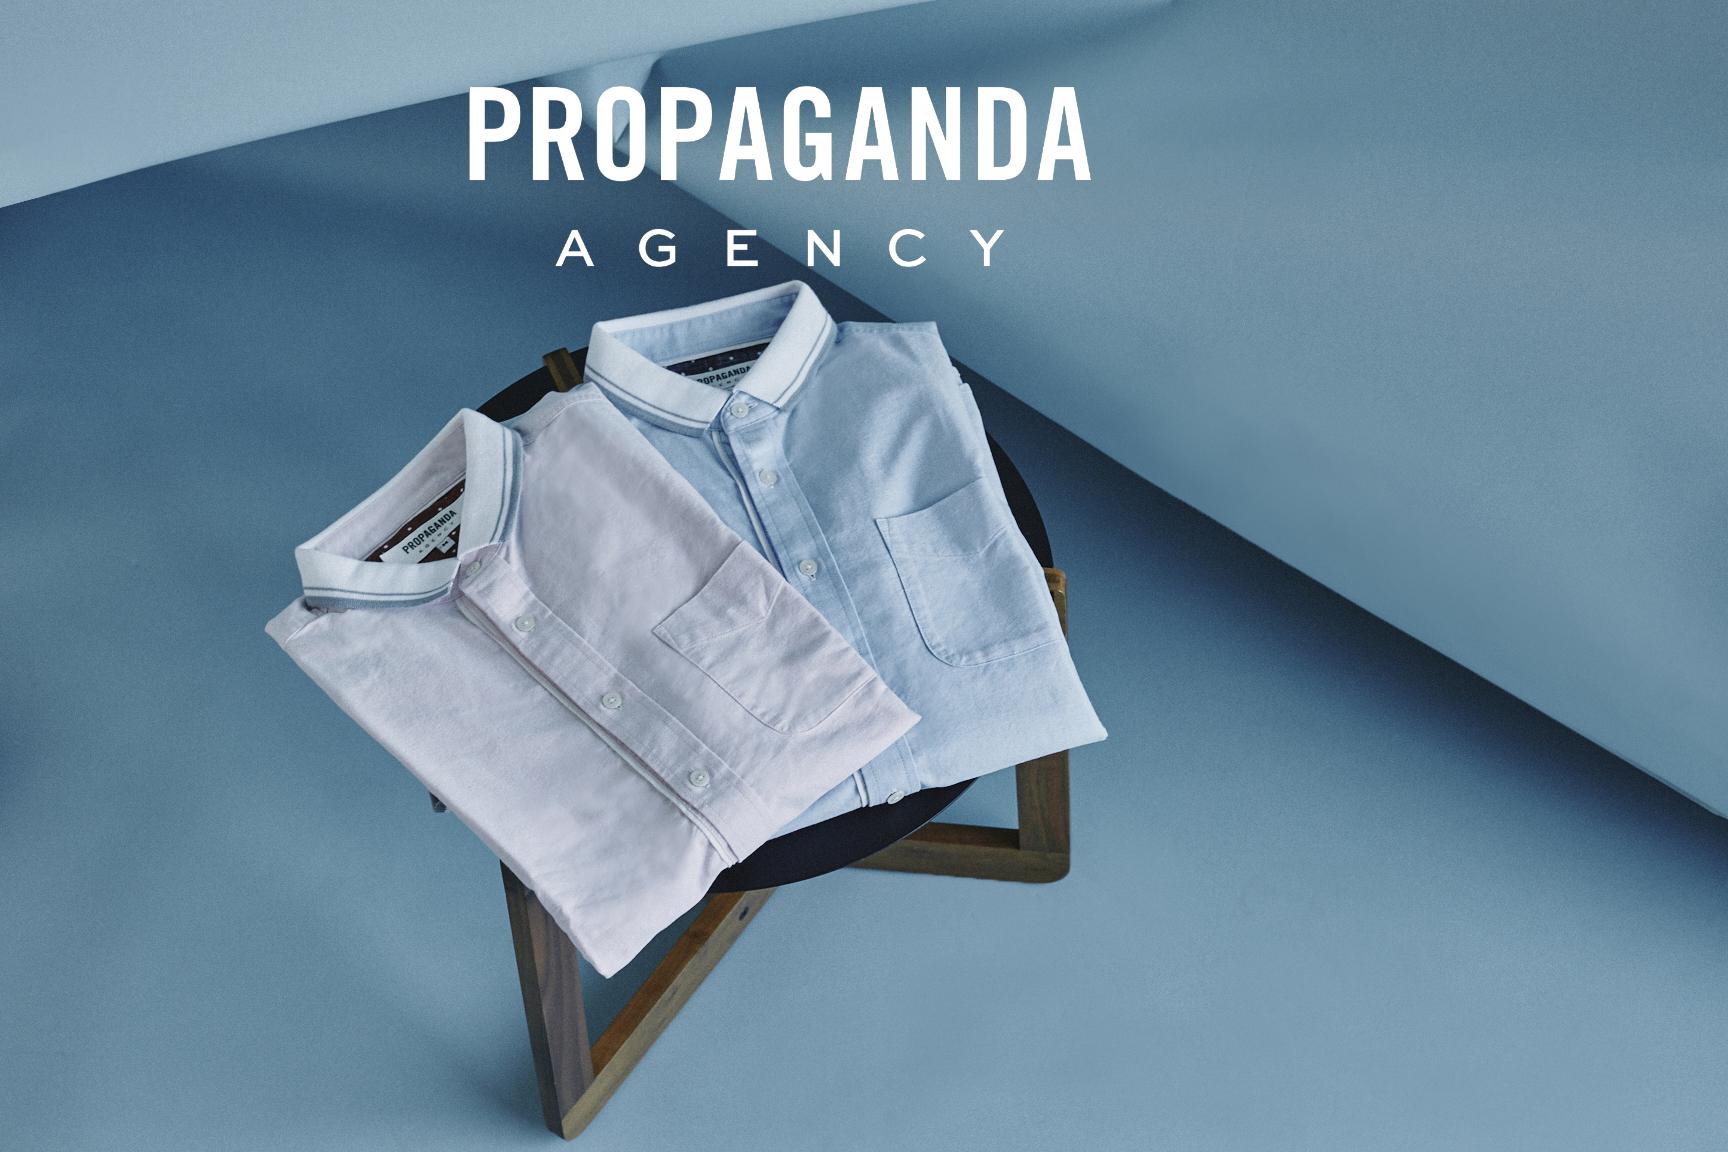 18_8_12_S_S_19_Propaganda23863_Final_logo.jpg